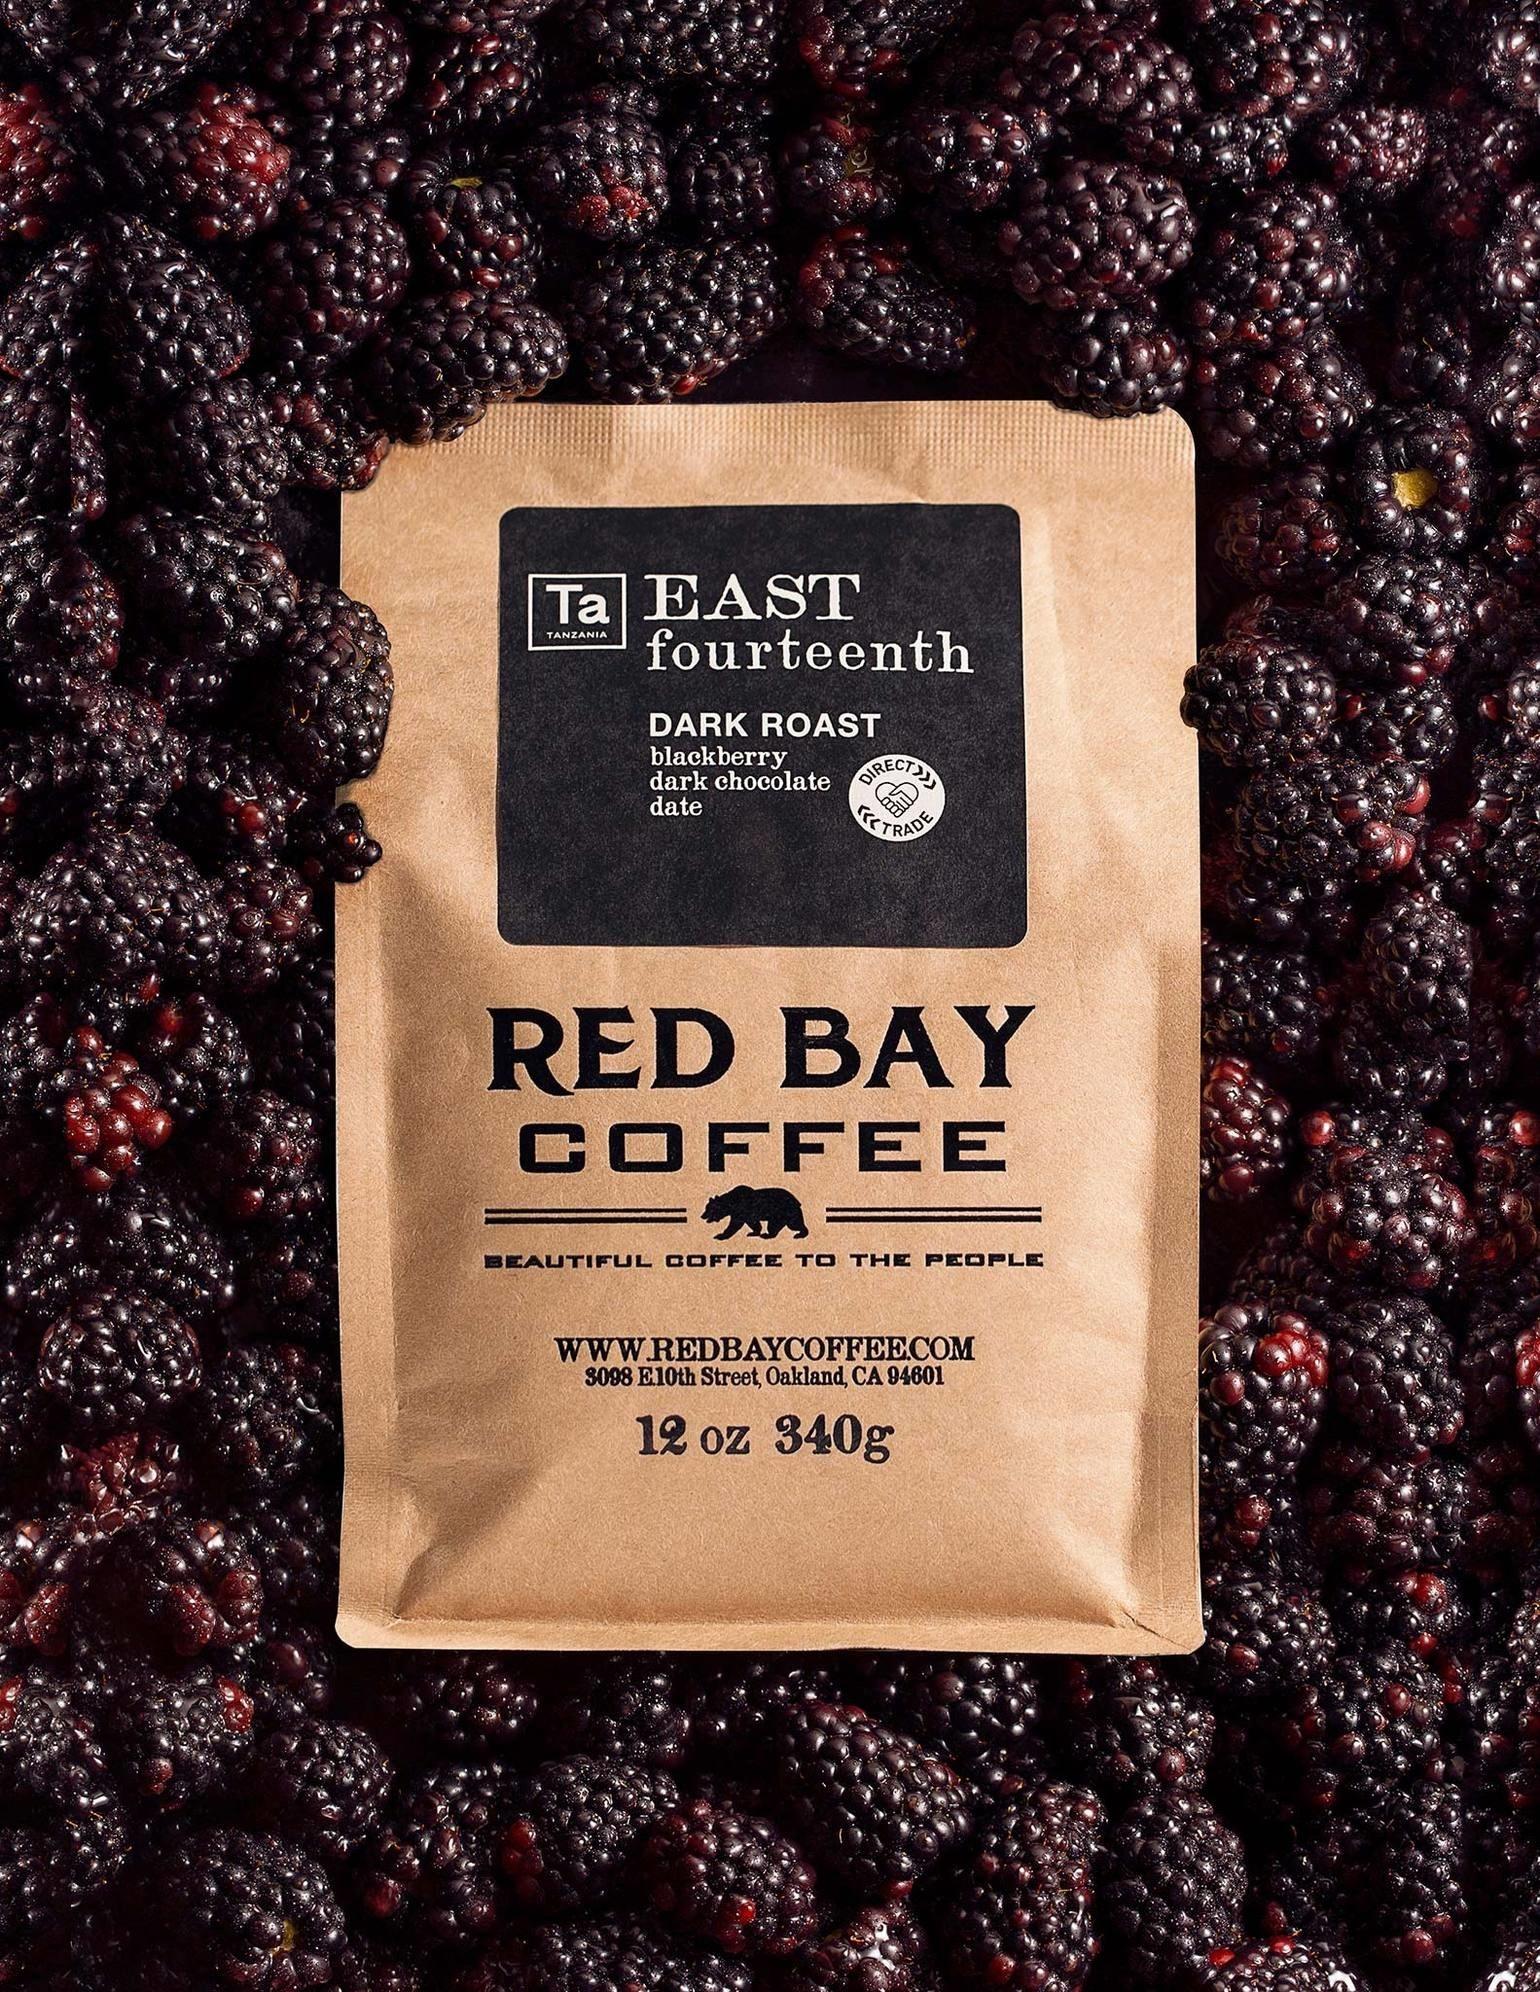 The bag of coffee